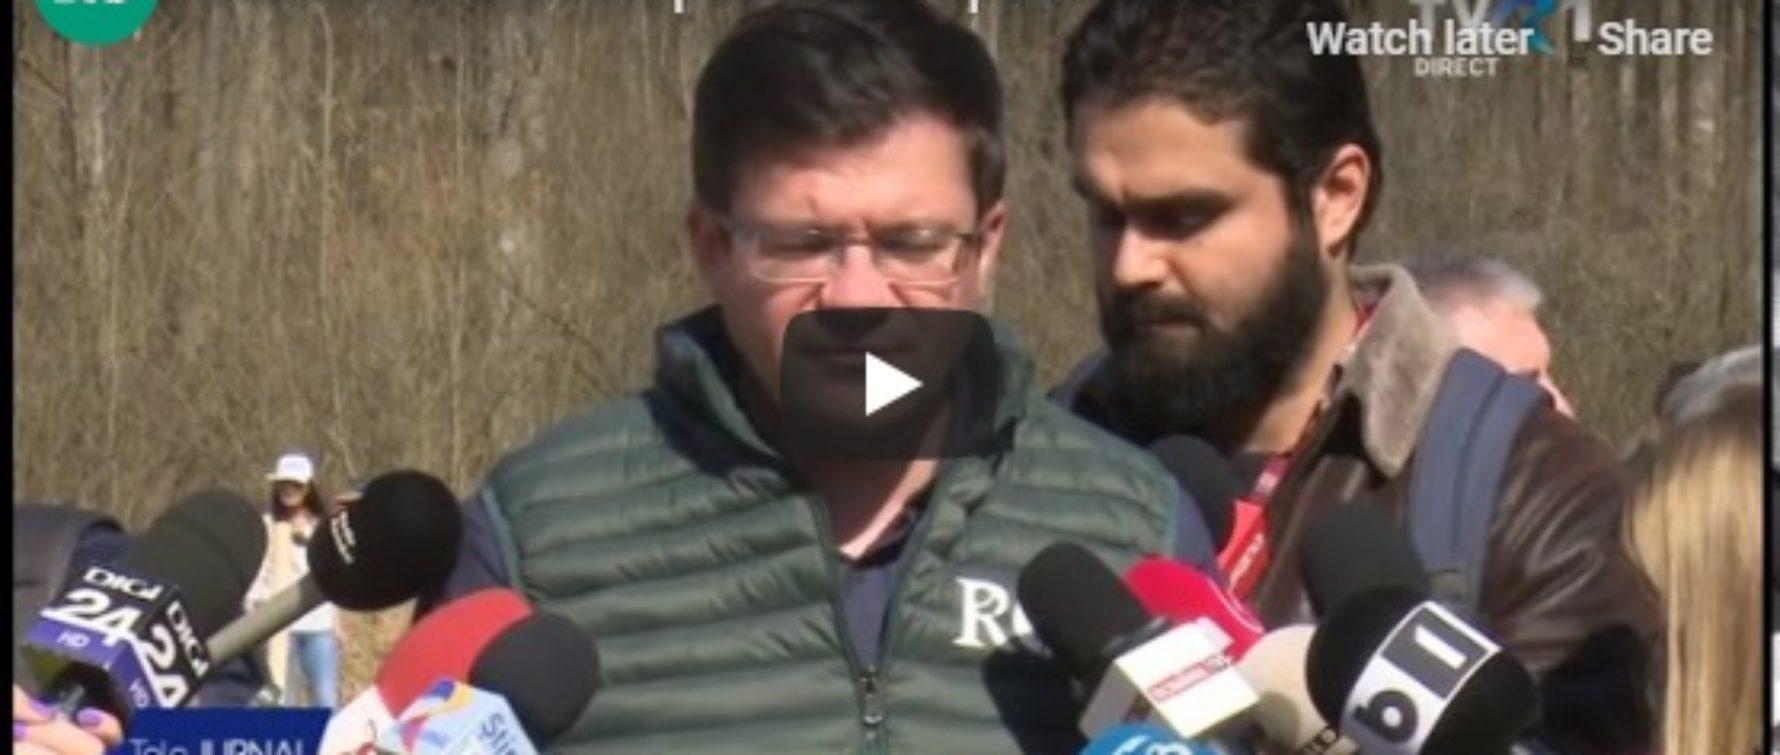 Cea mai mare campanie de impadurire din Romania a fost lansata vineri in Dambovita